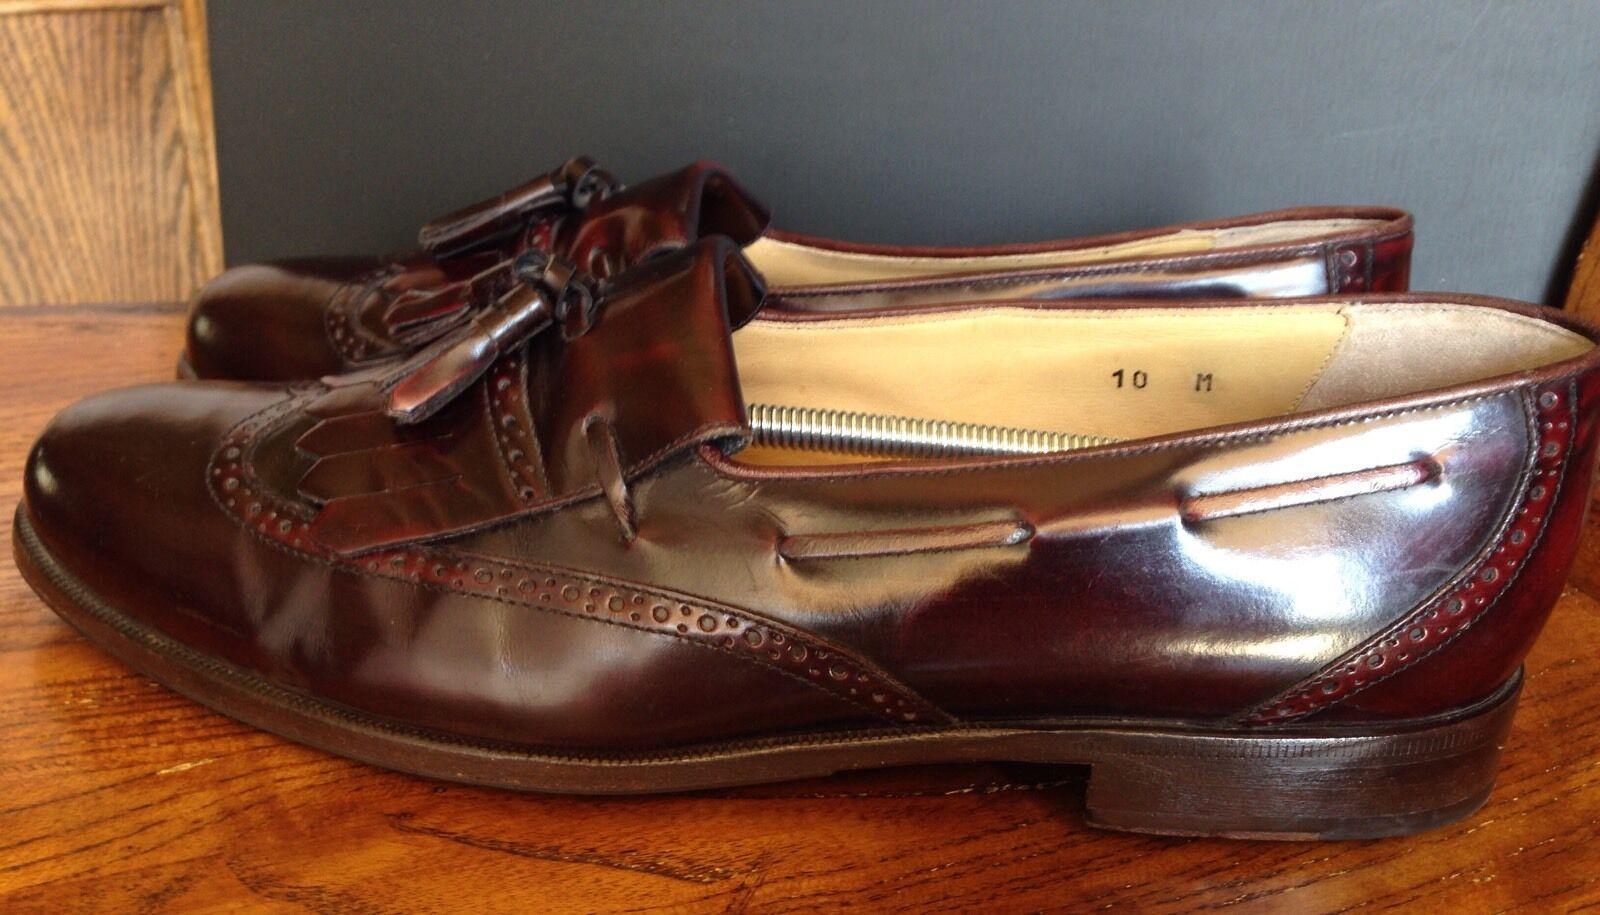 Nordstrom Uomo Tassel Dress Shoes Loafer Wing Tips Tassel Uomo Burgundy Made in Italy 10M 6e60ae